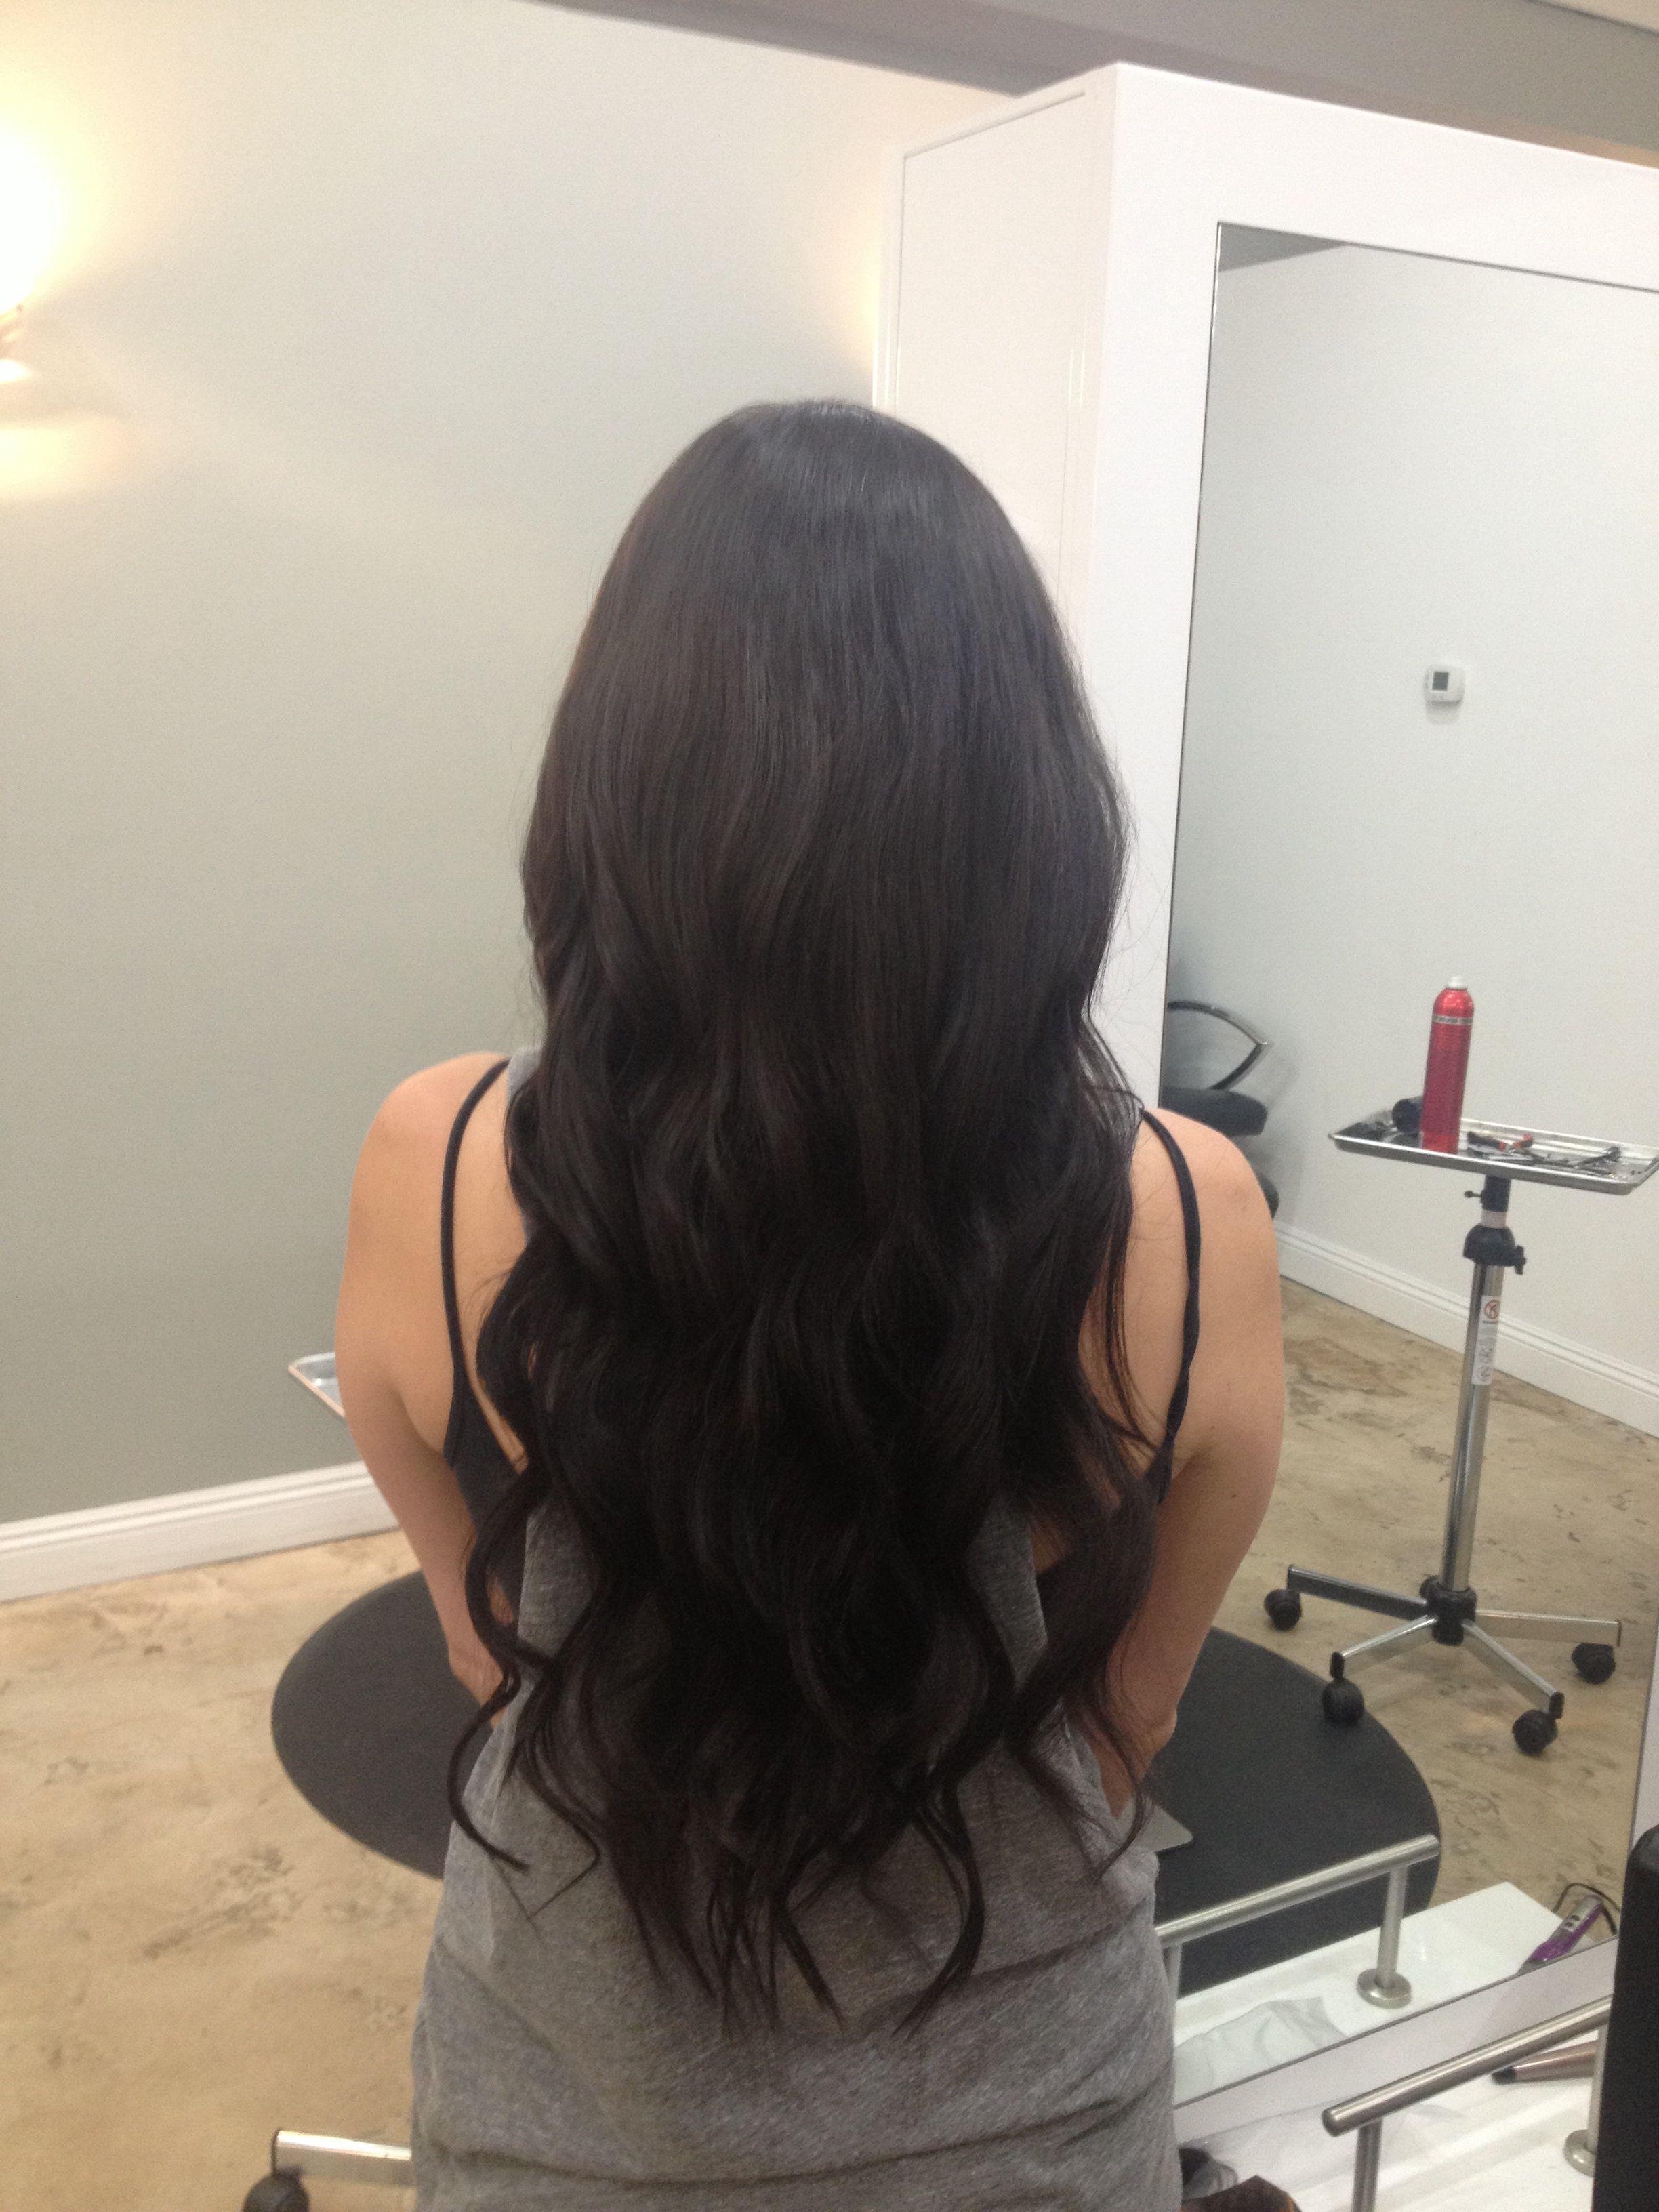 Andrea prchal primo salon studio scottsdale arizona follow me on